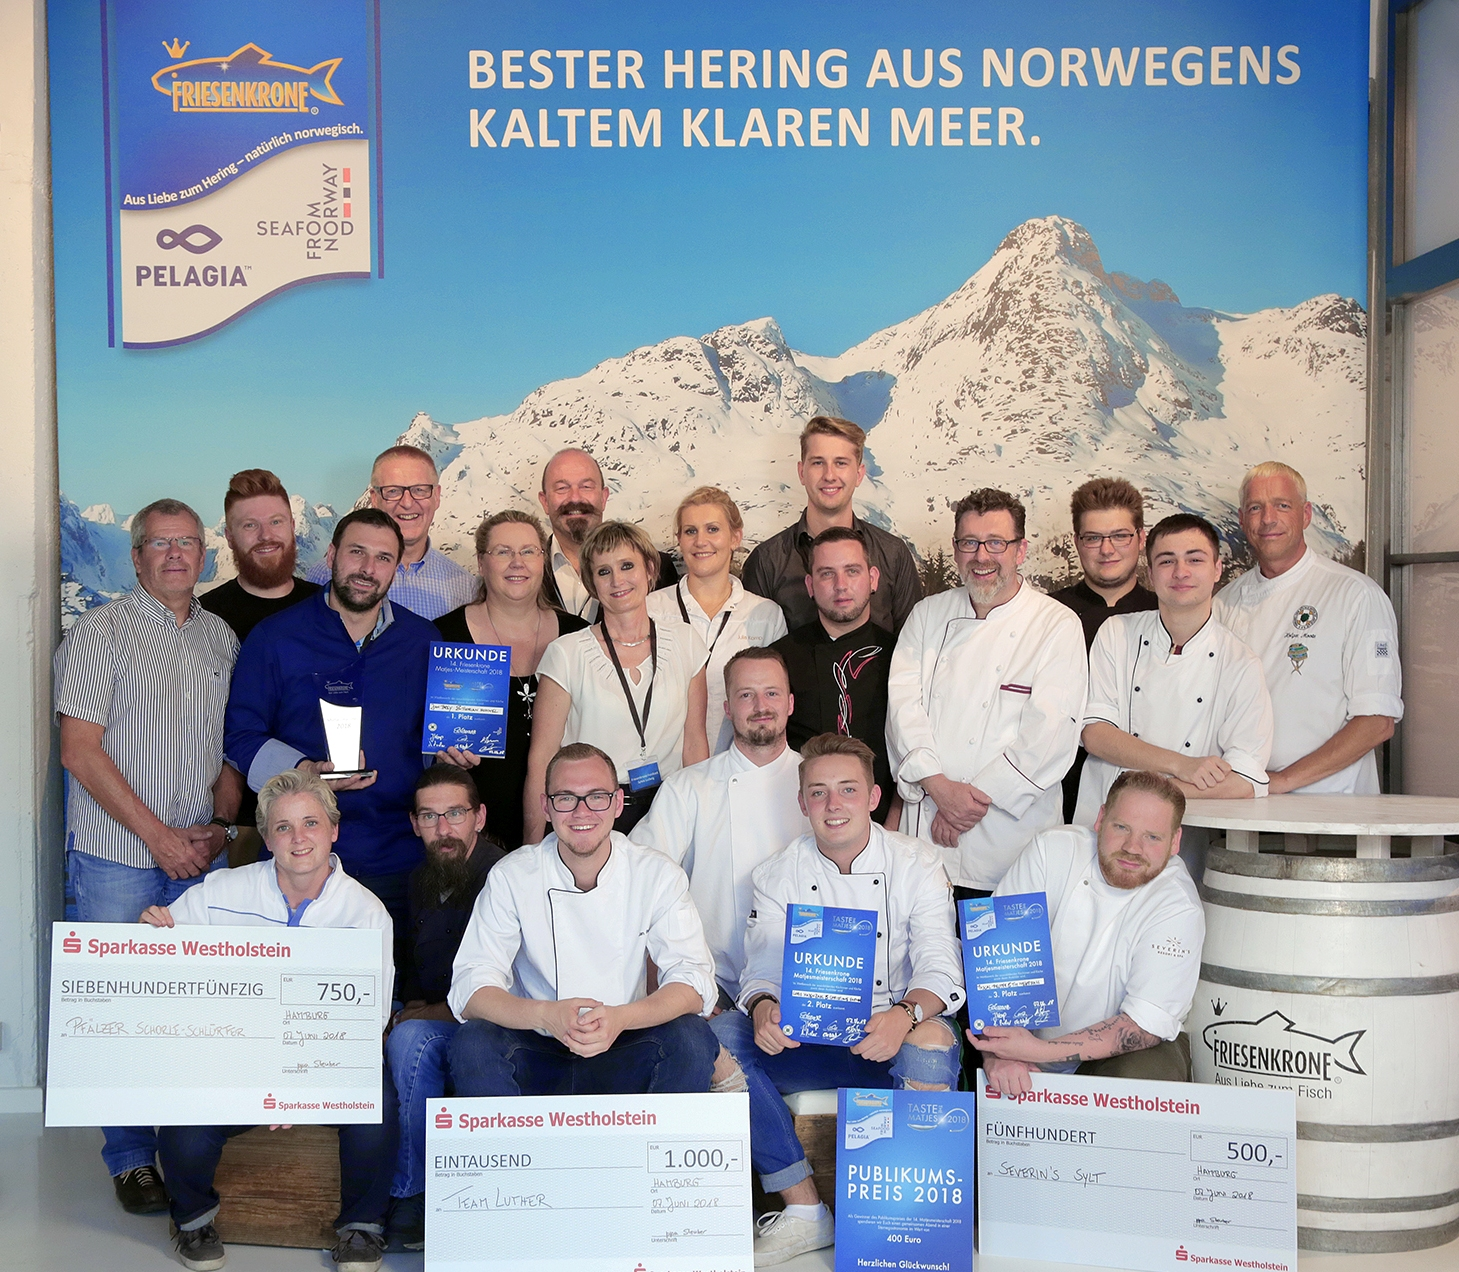 Sieger der 14. Friesenkrone Matjesmeisterschaft stehen fest